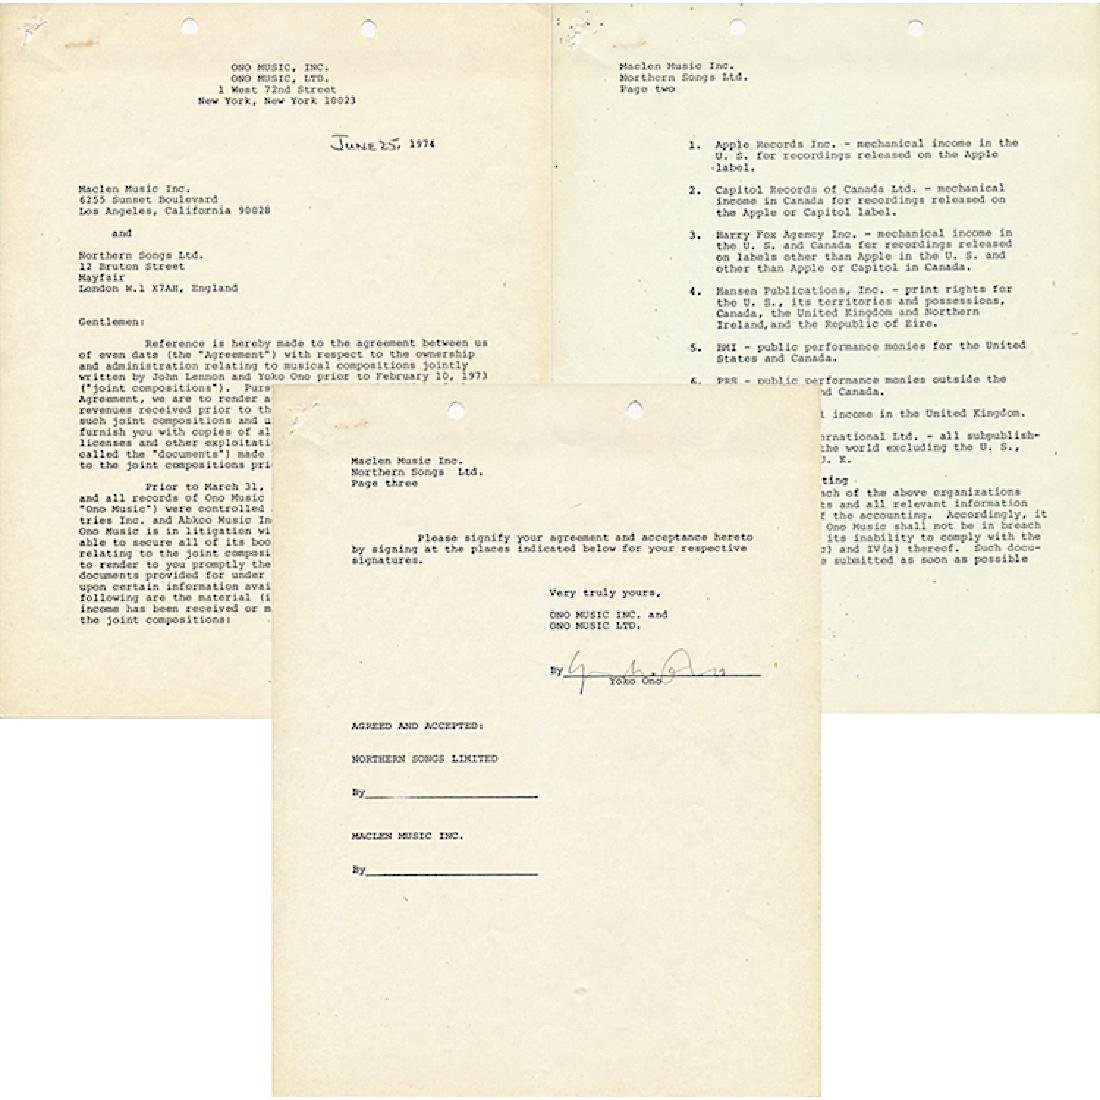 Yoko Ono - John Lennon - 1975 Correspondence Letter